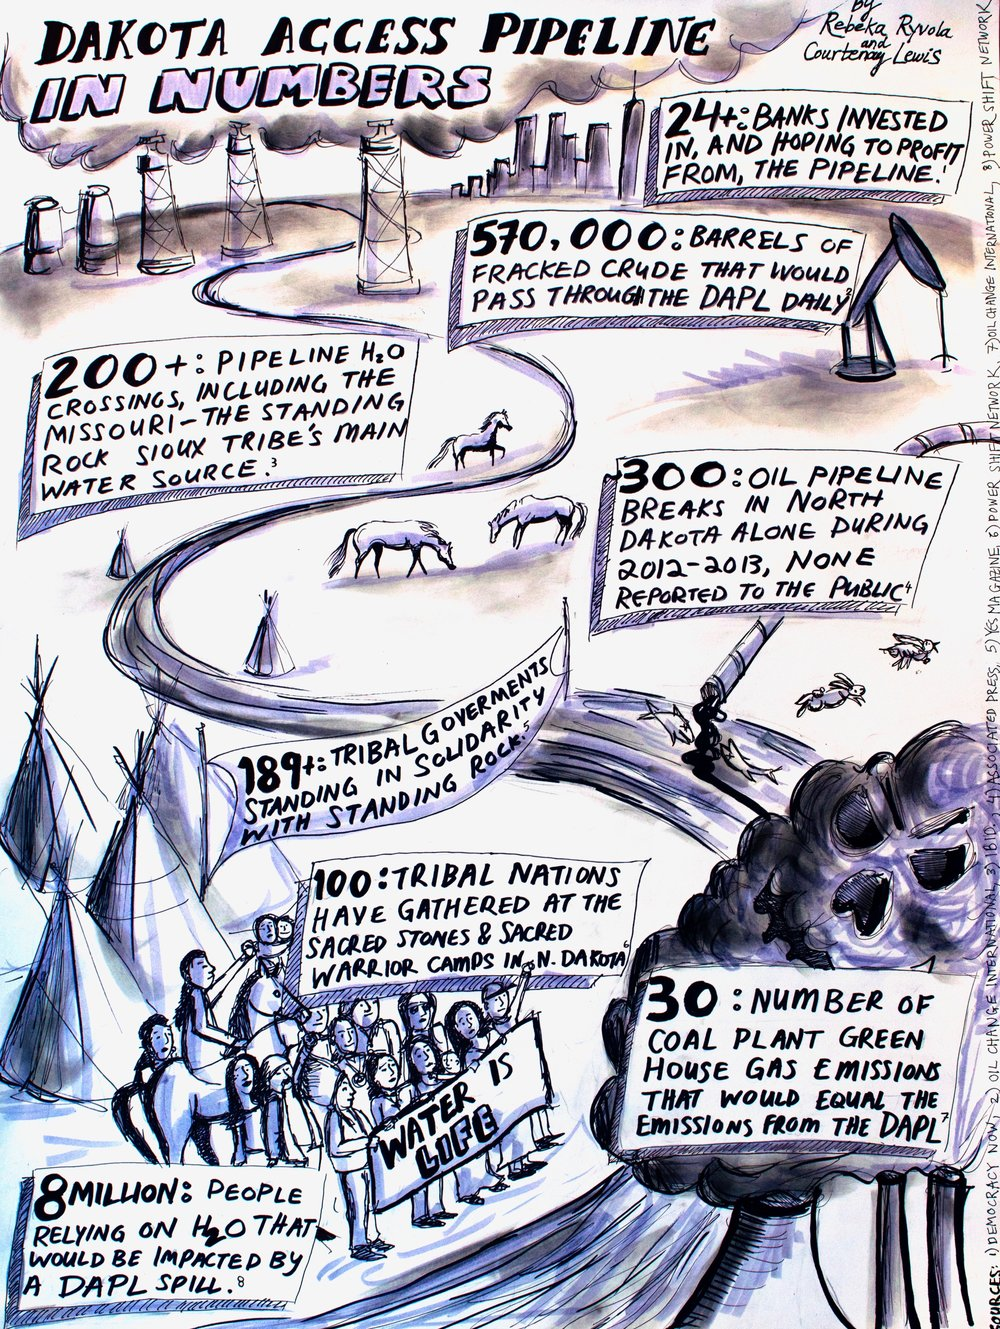 Infographic on the Dakota Access Pipeline, with Rebeka Ryvola (2016)